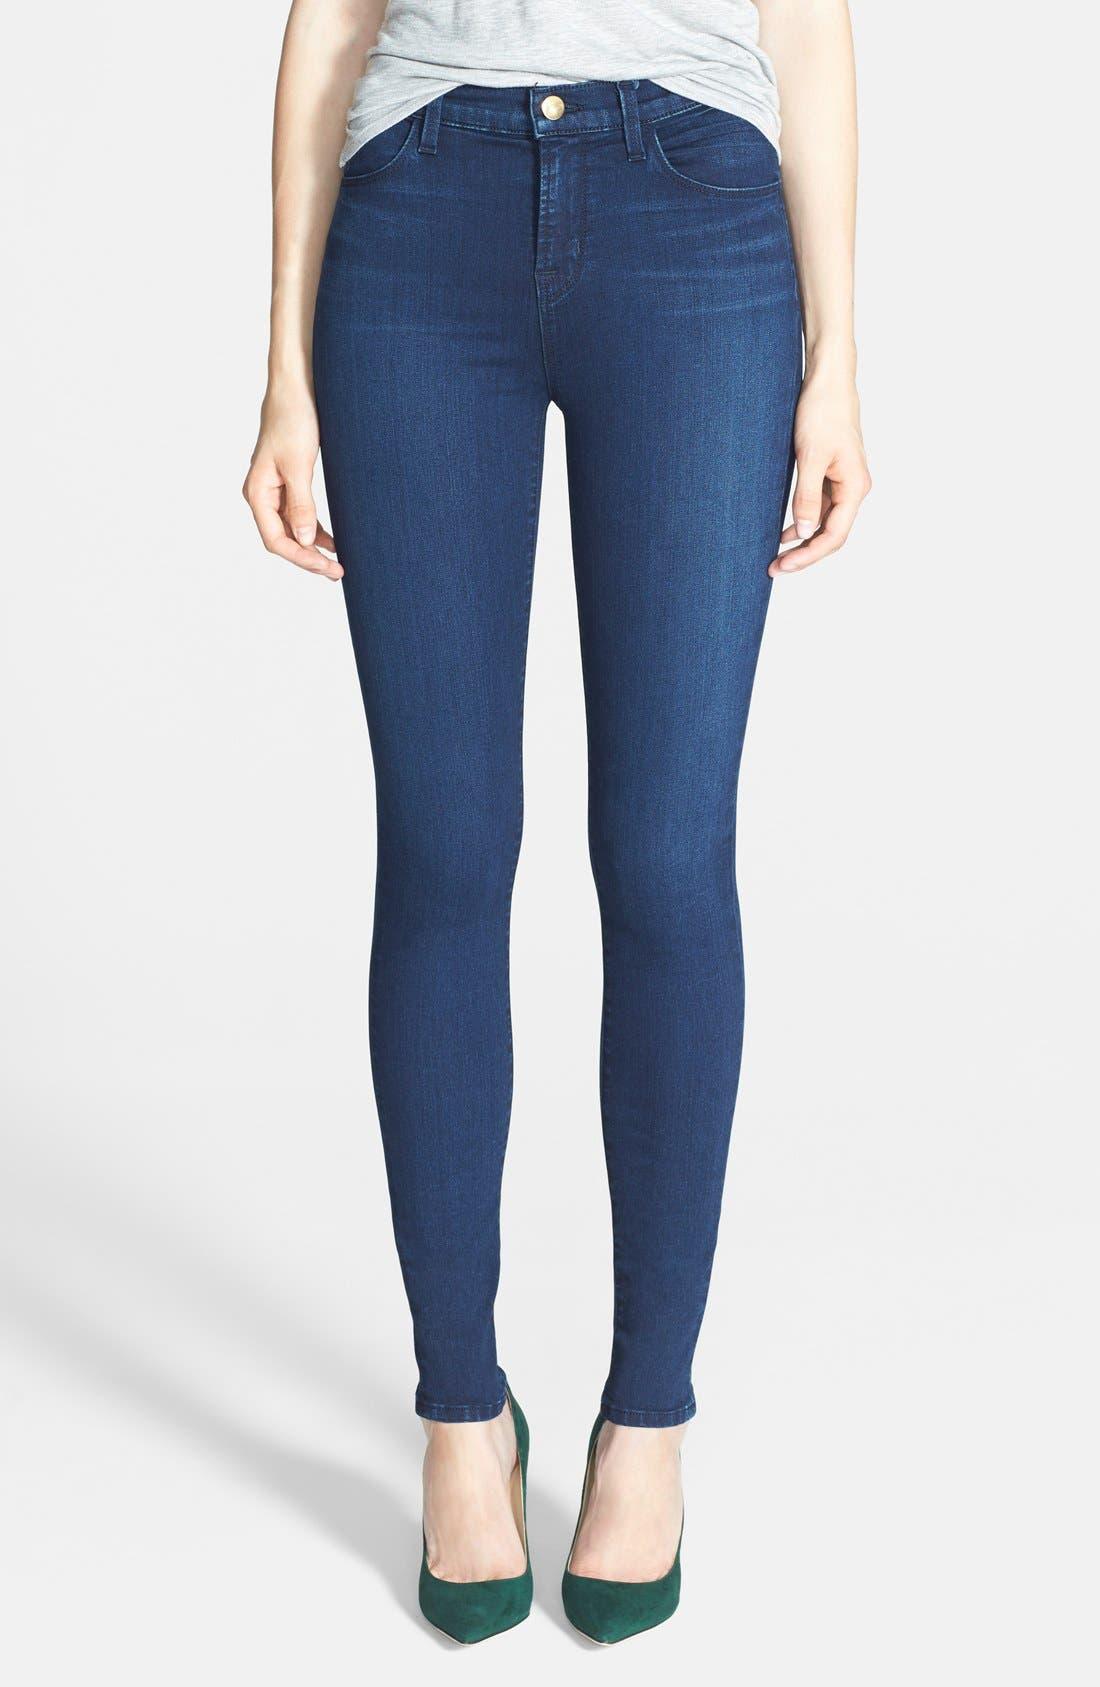 Alternate Image 1 Selected - J Brand 'Maria' High Rise Skinny Jeans (Maria Destiny)